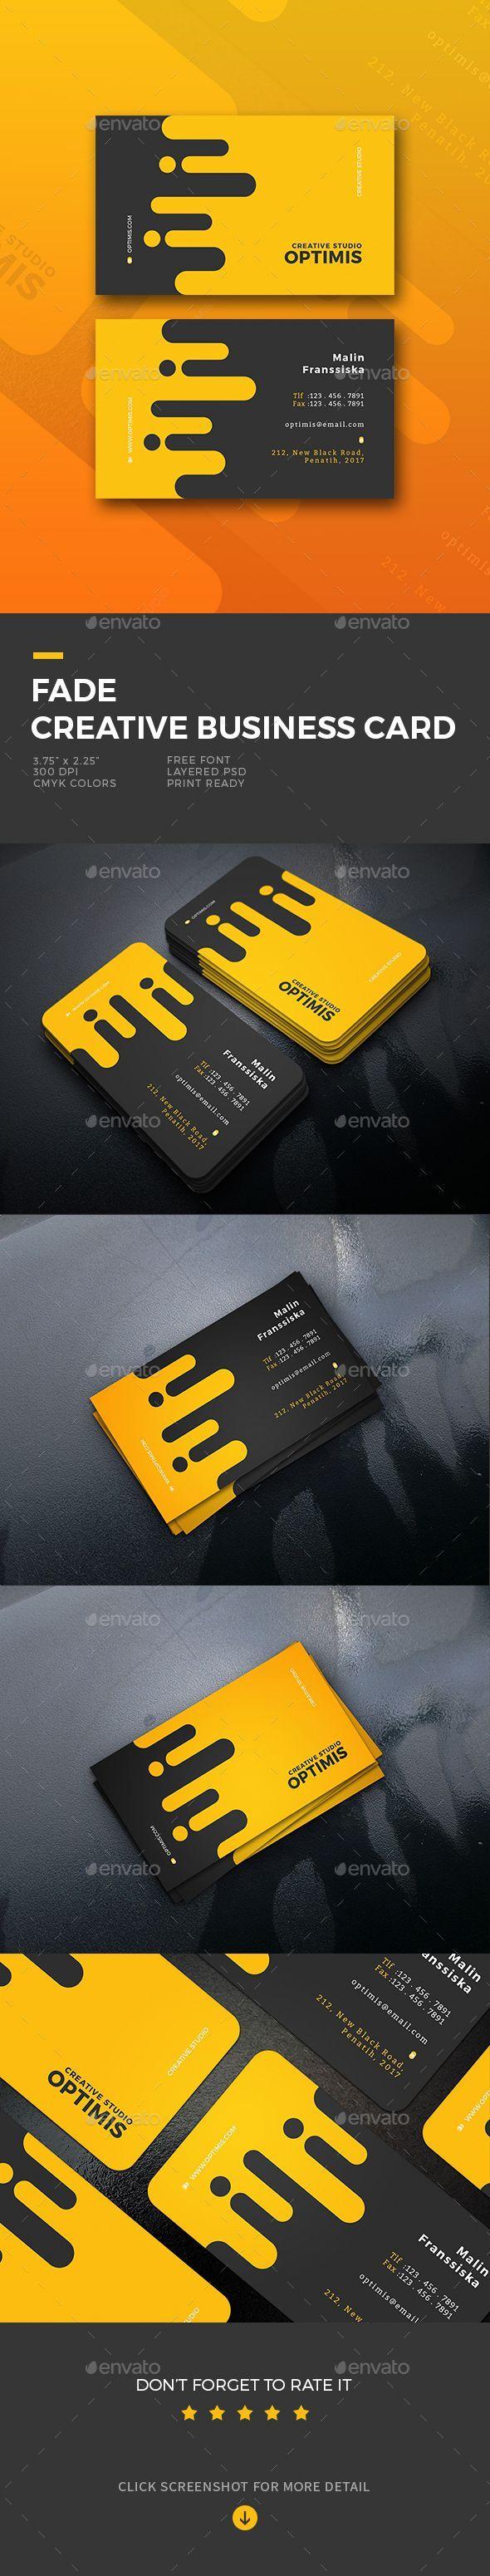 9469 Best Business Cards Maker Images On Pinterest Business Card